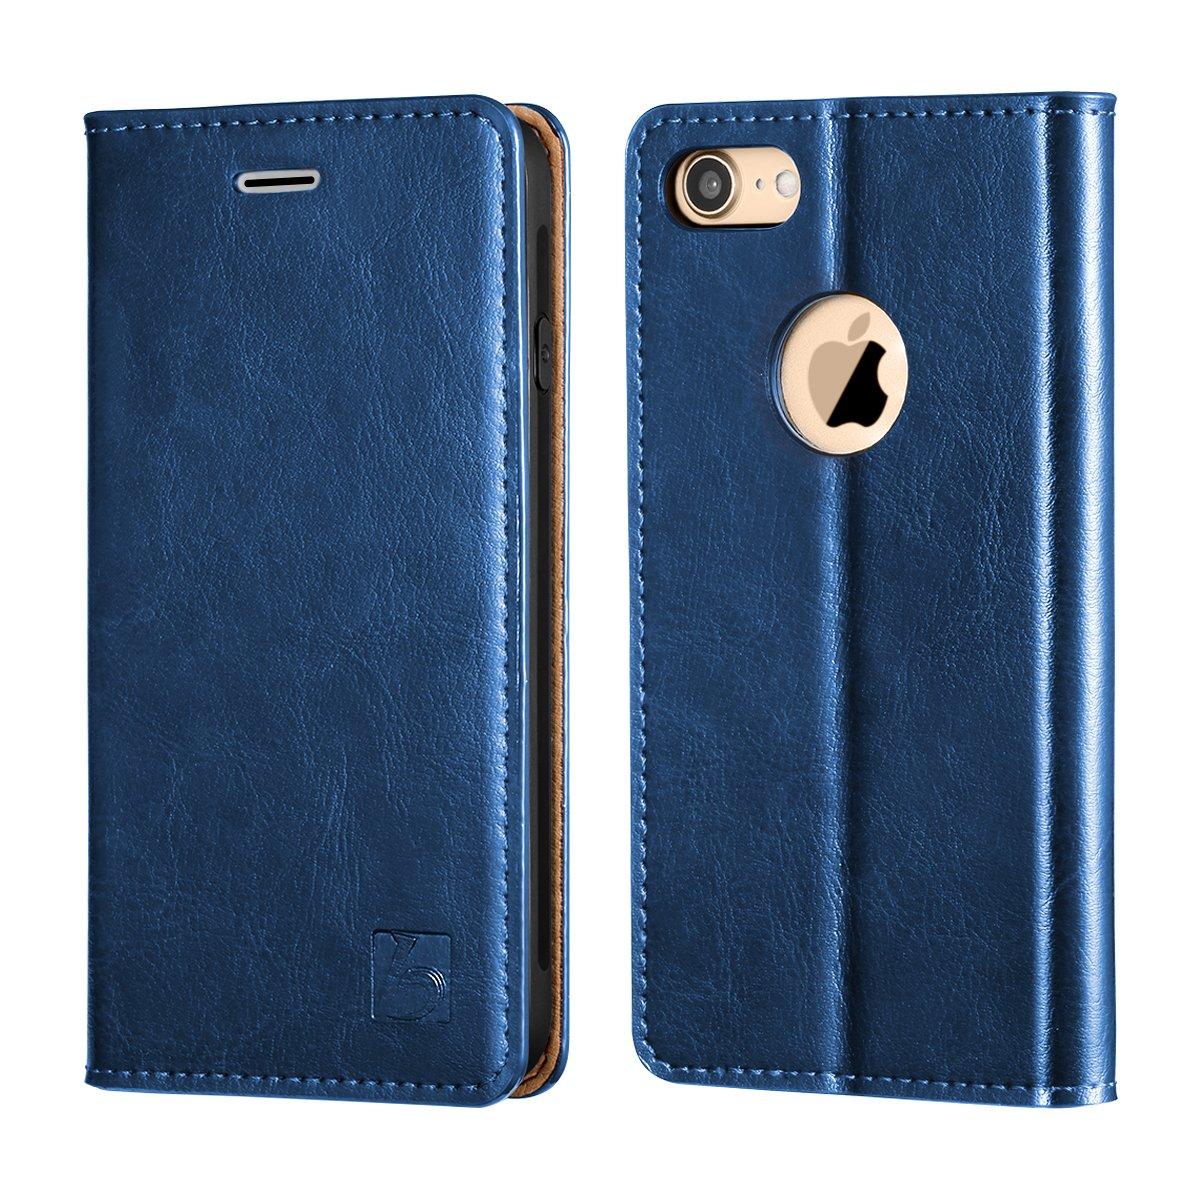 iphone 8 blue wallet case